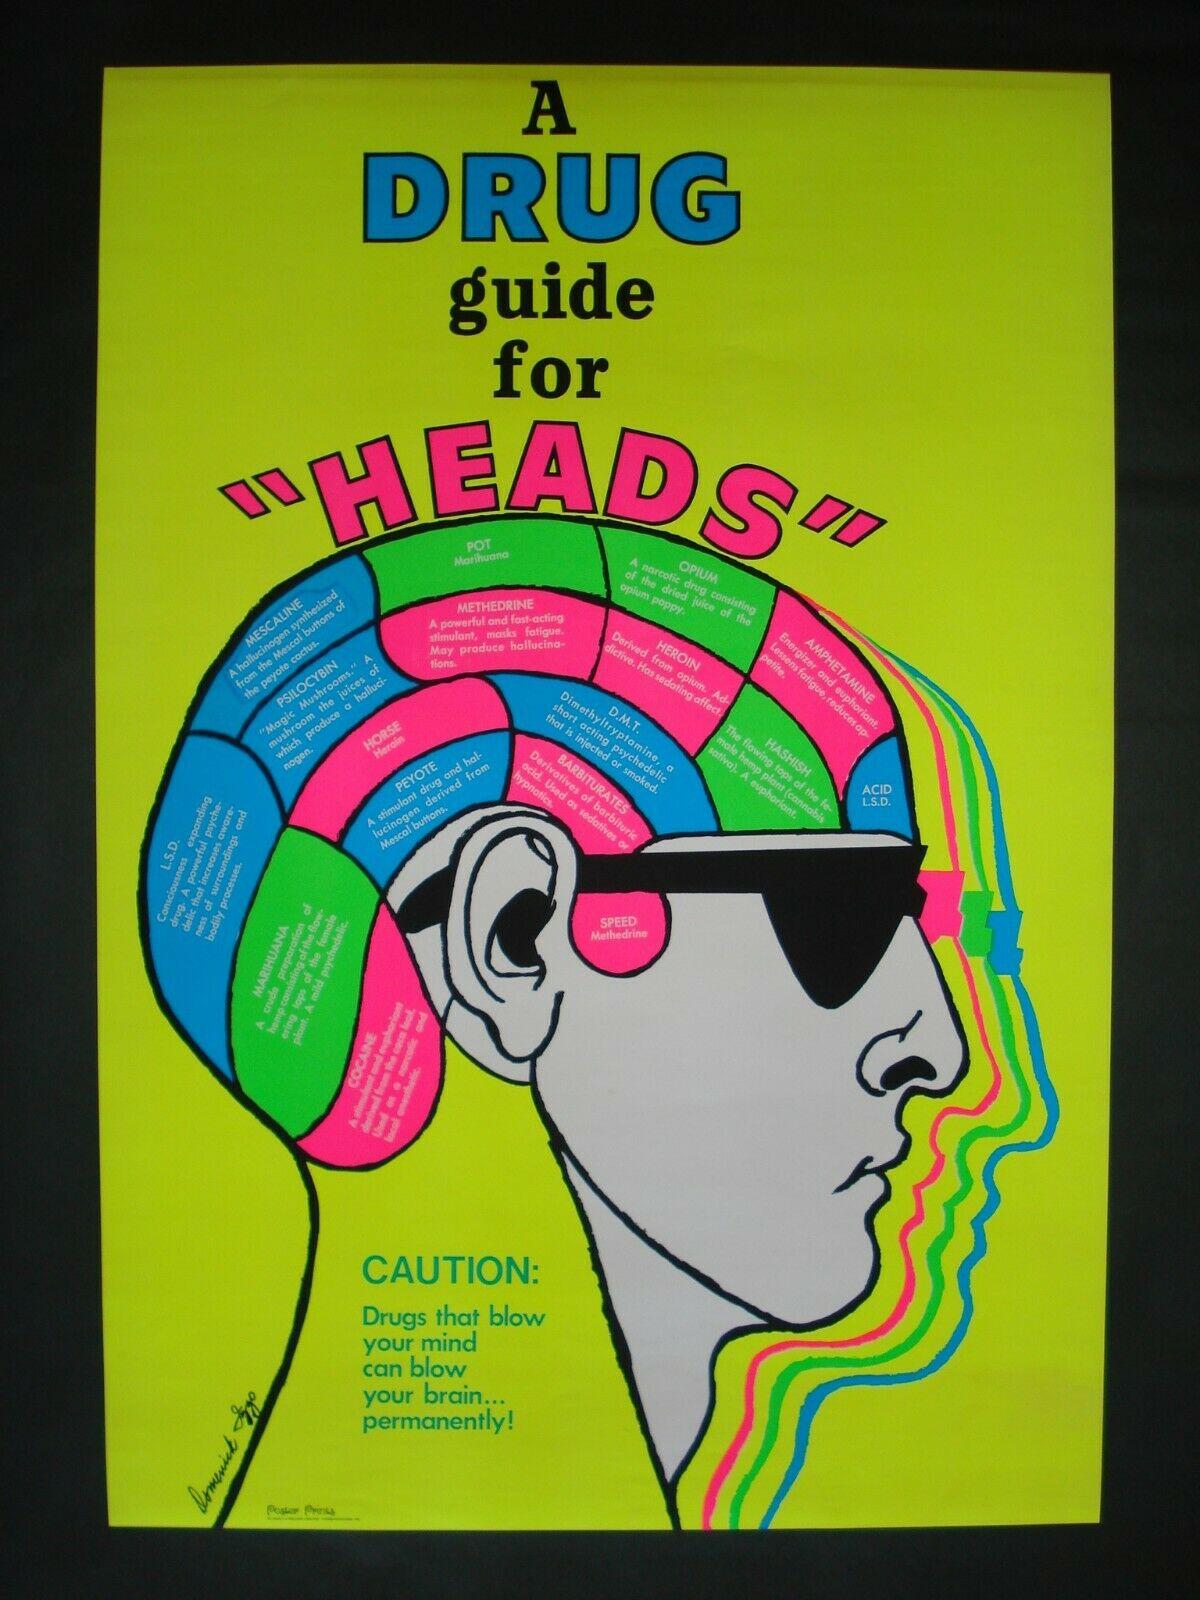 Drug guide for heads